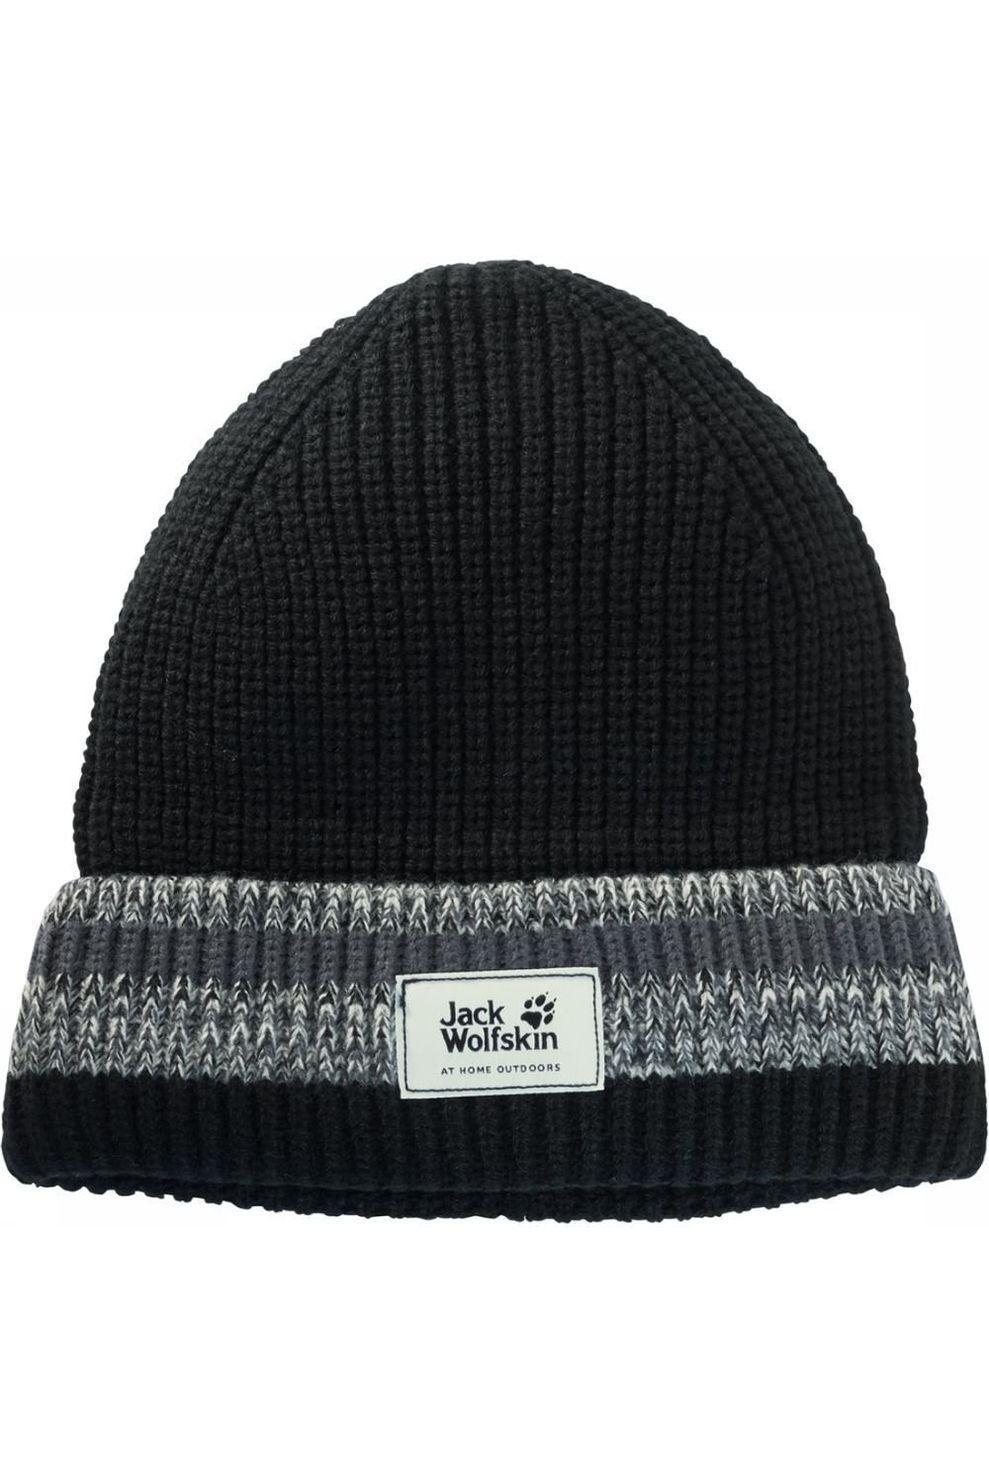 Jack Wolfskin Muts Knit - Zwart - Maat: L